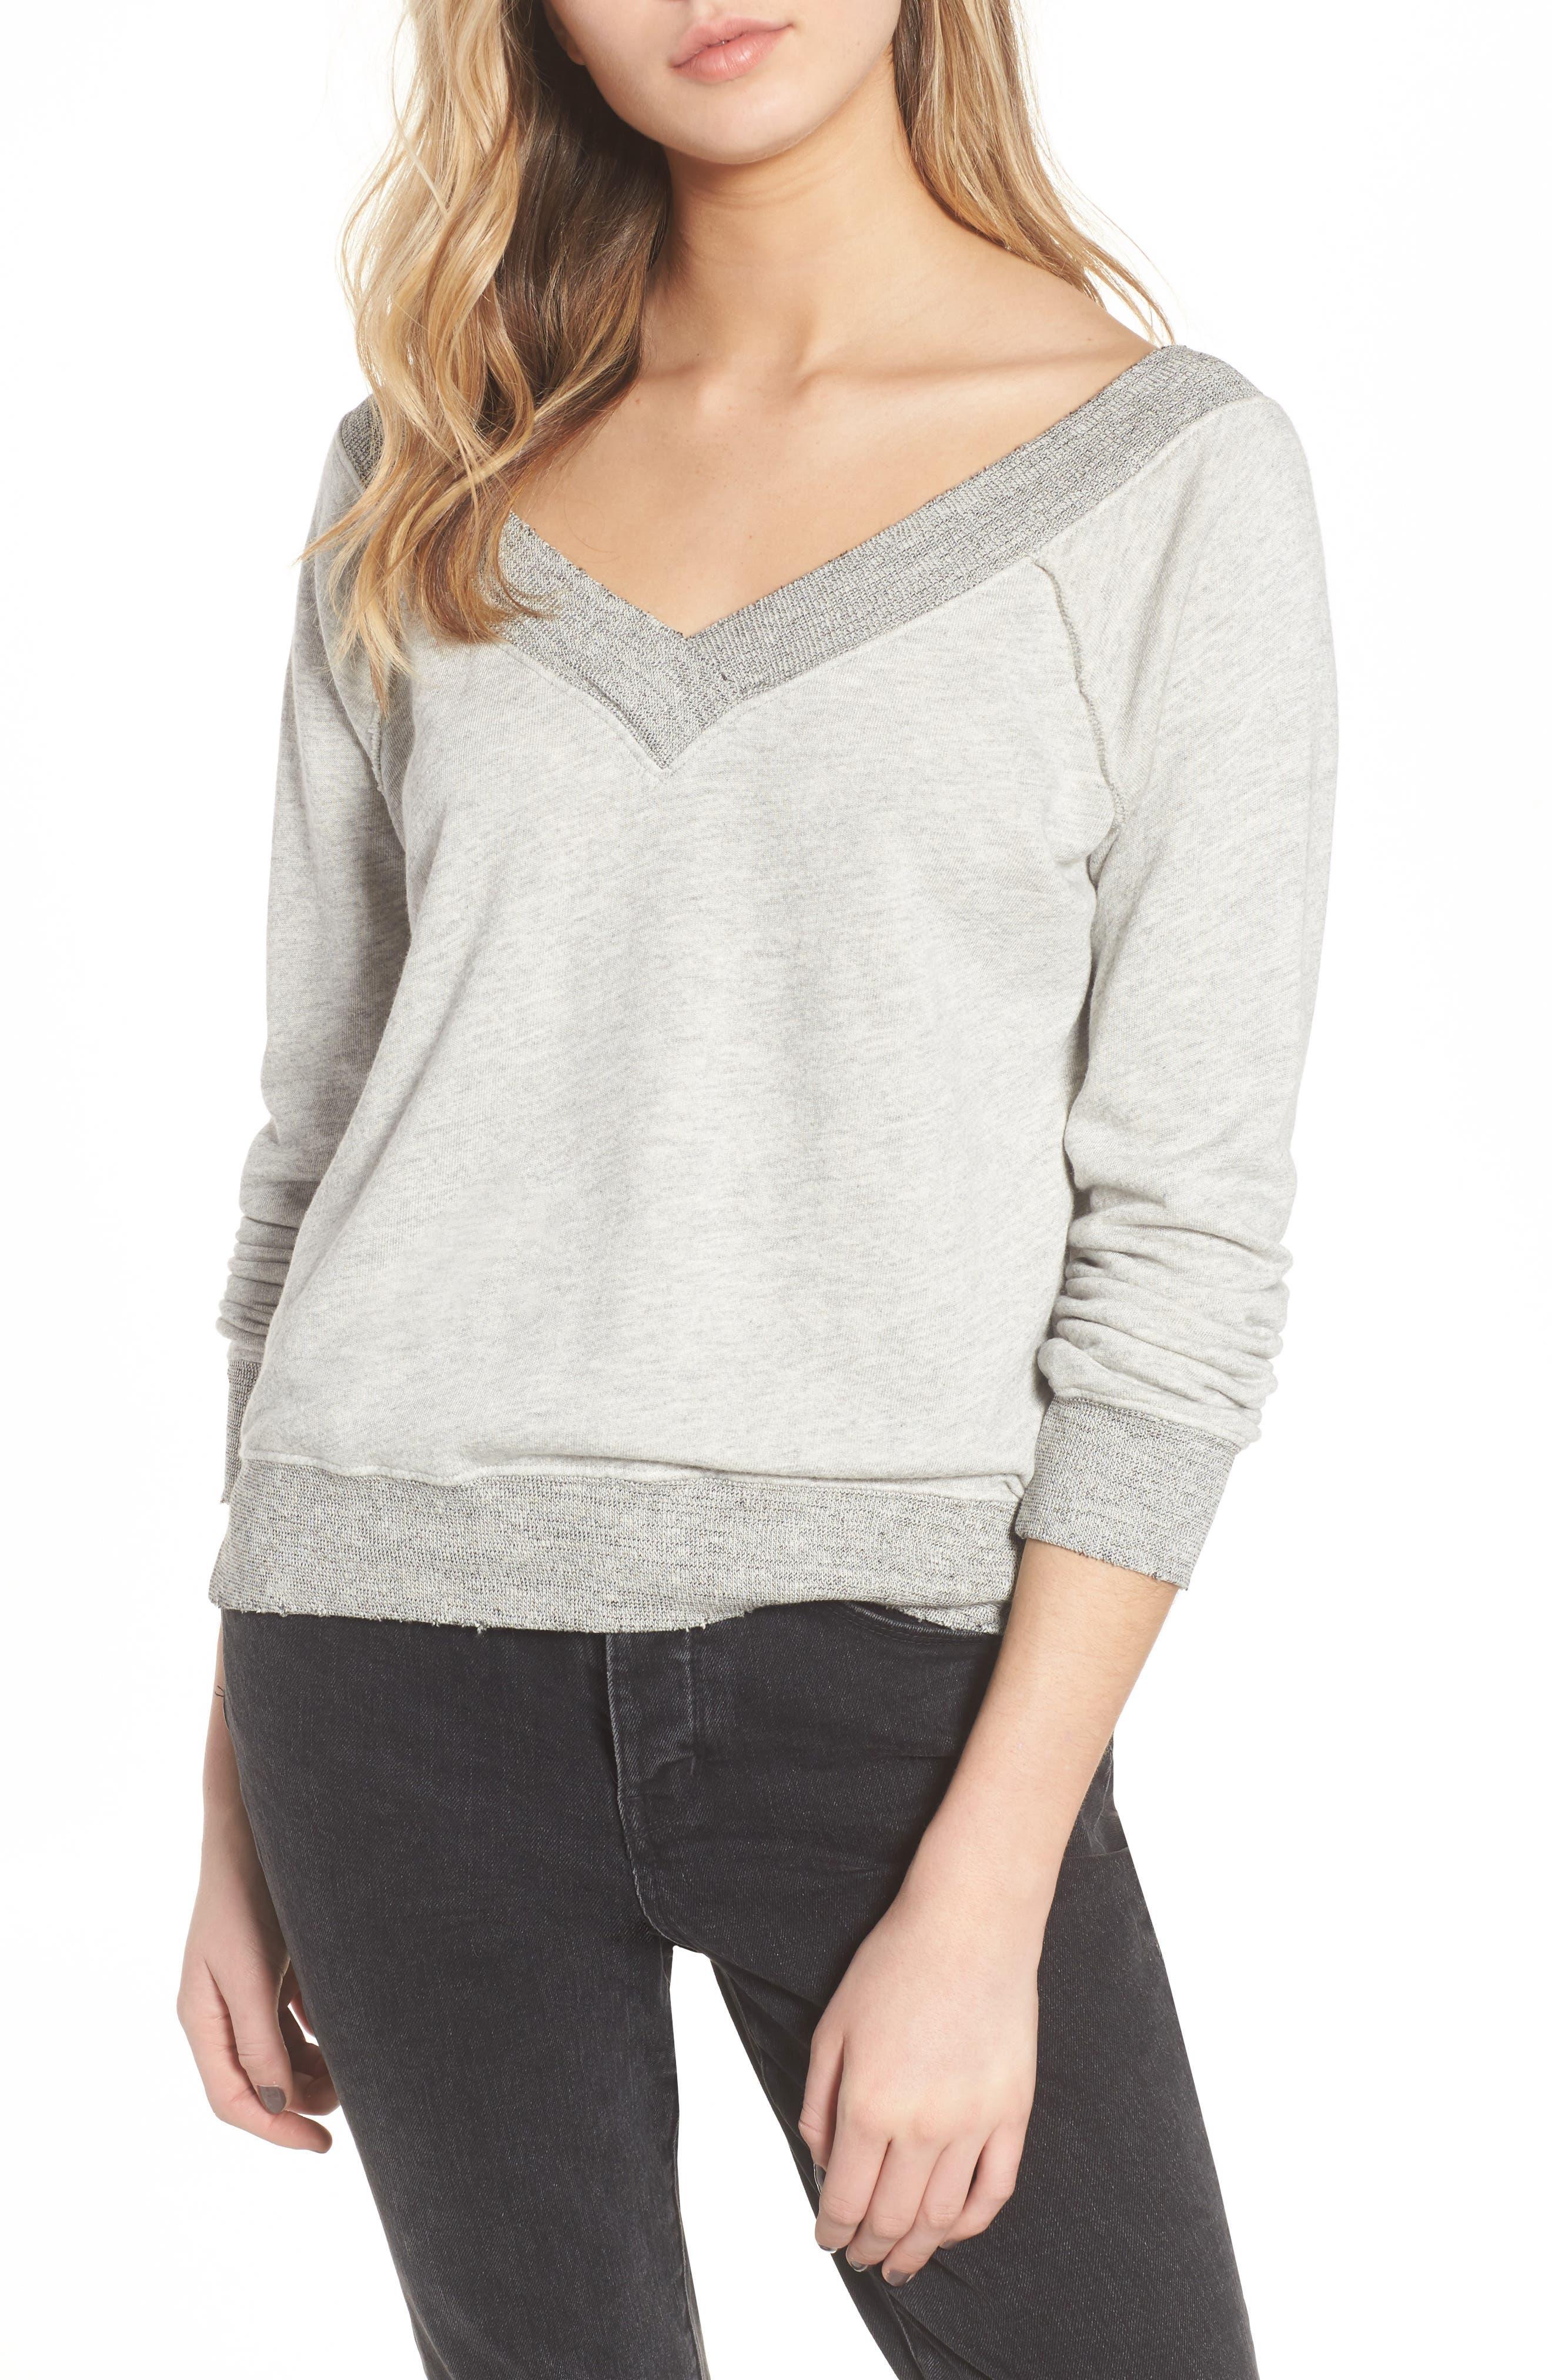 Mayer V-Neck Sweatshirt,                             Main thumbnail 1, color,                             Heather Grey